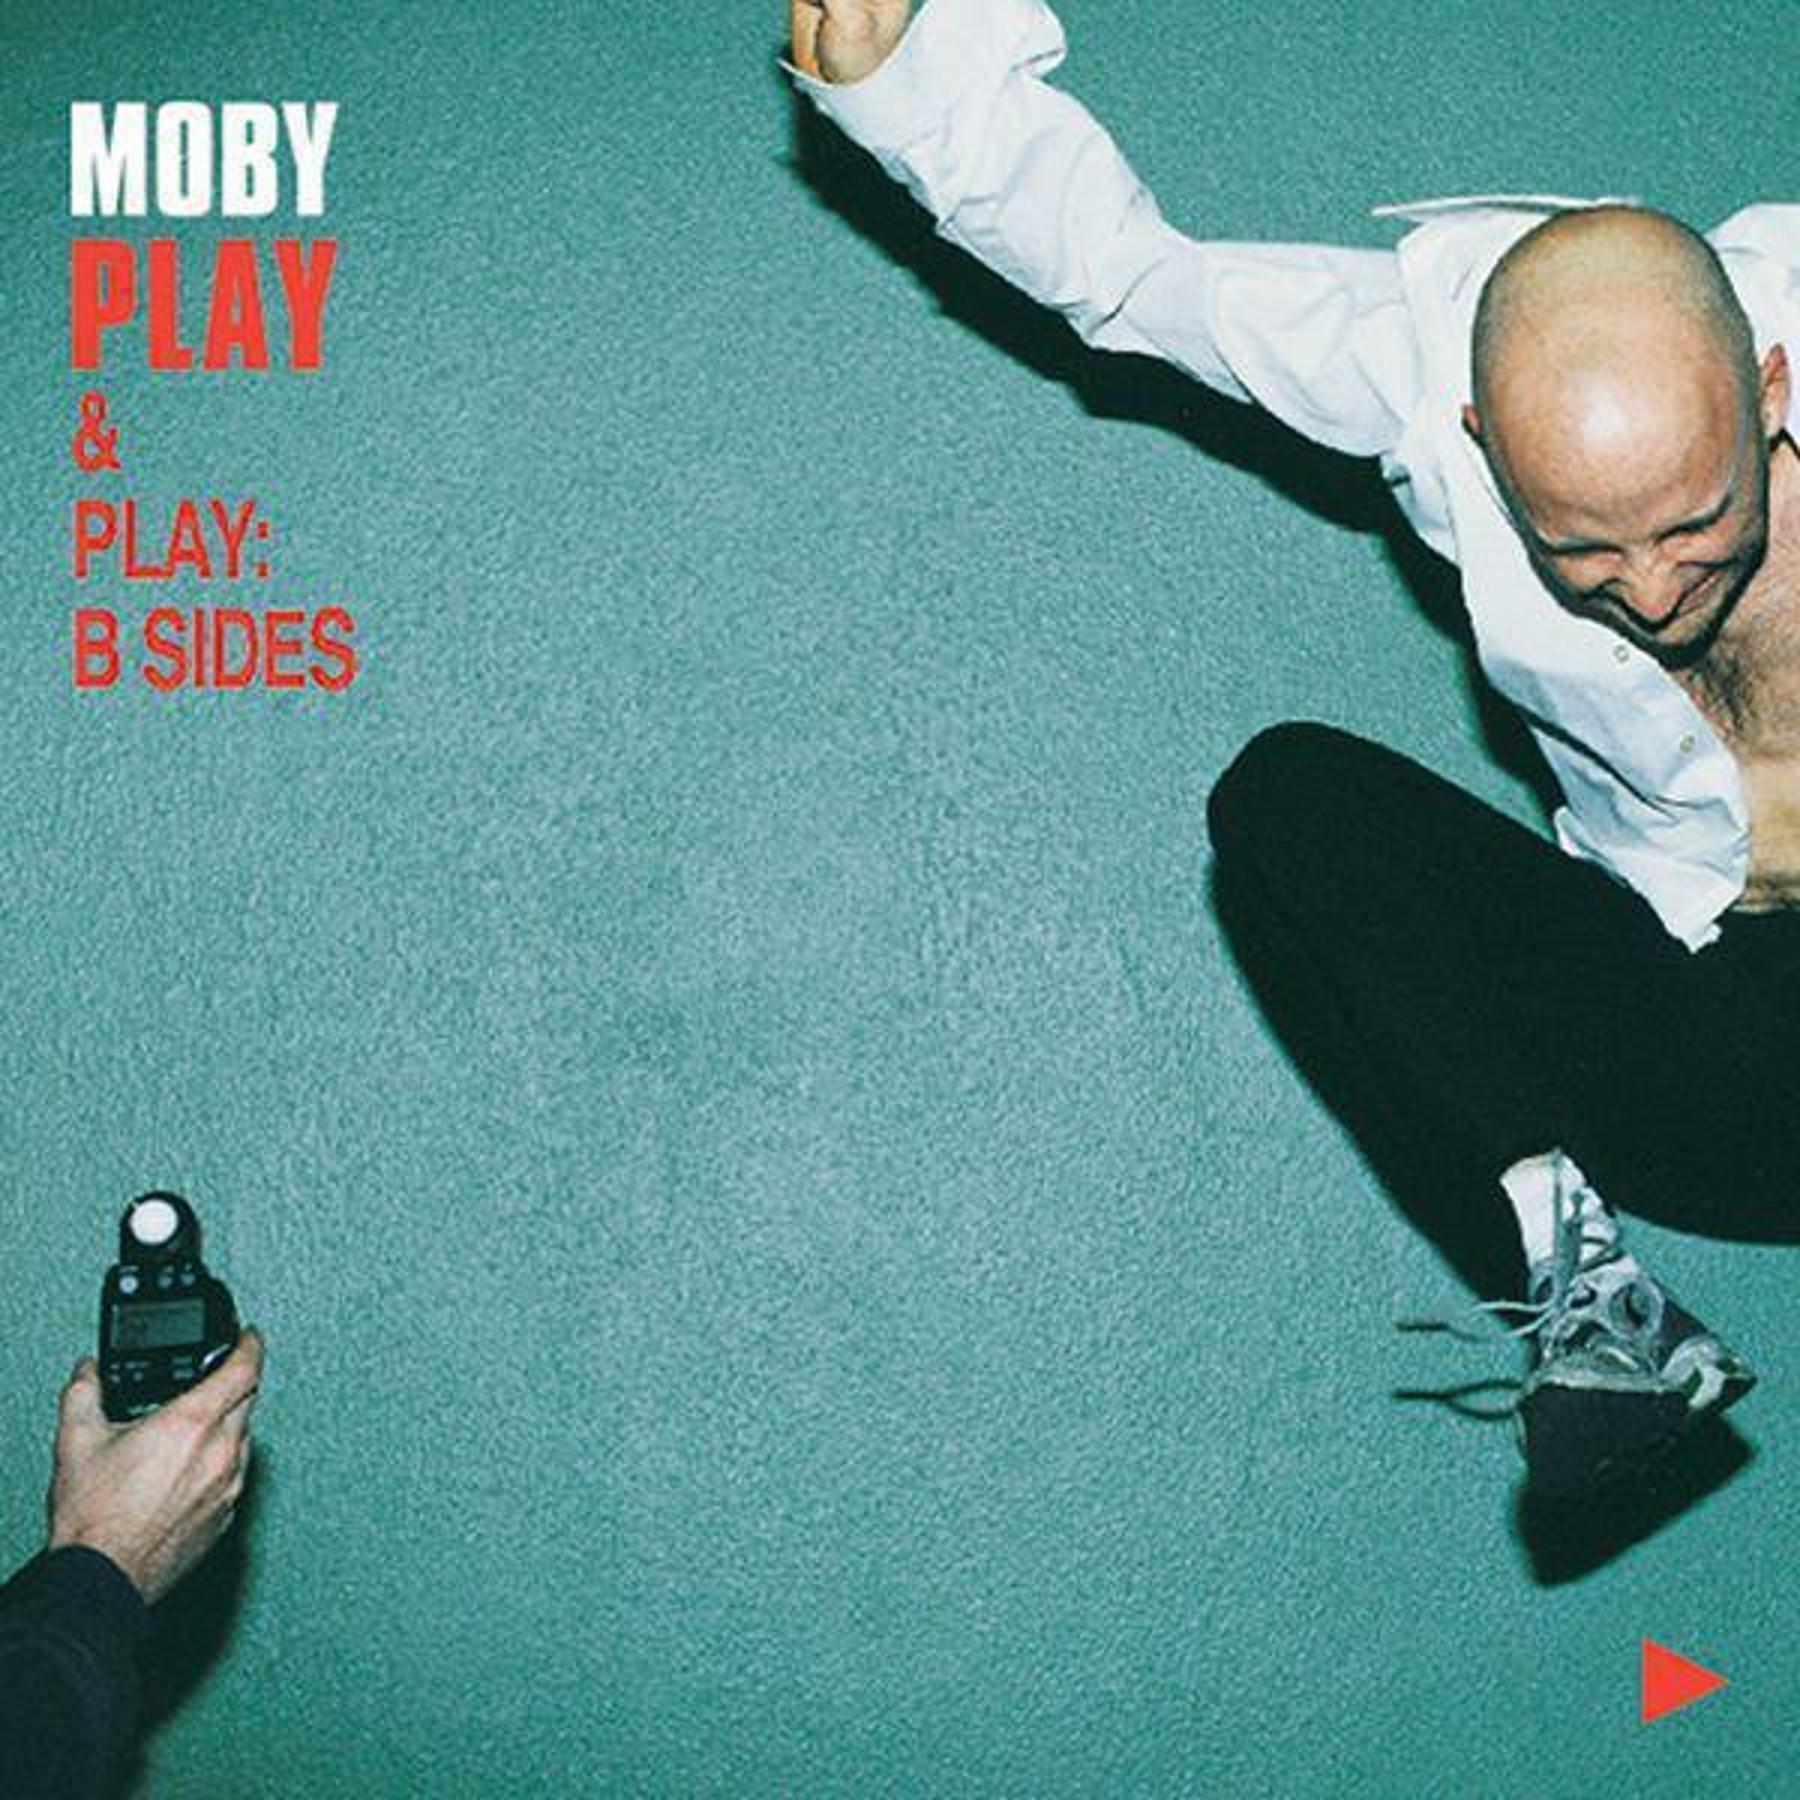 Bodyrock by Moby